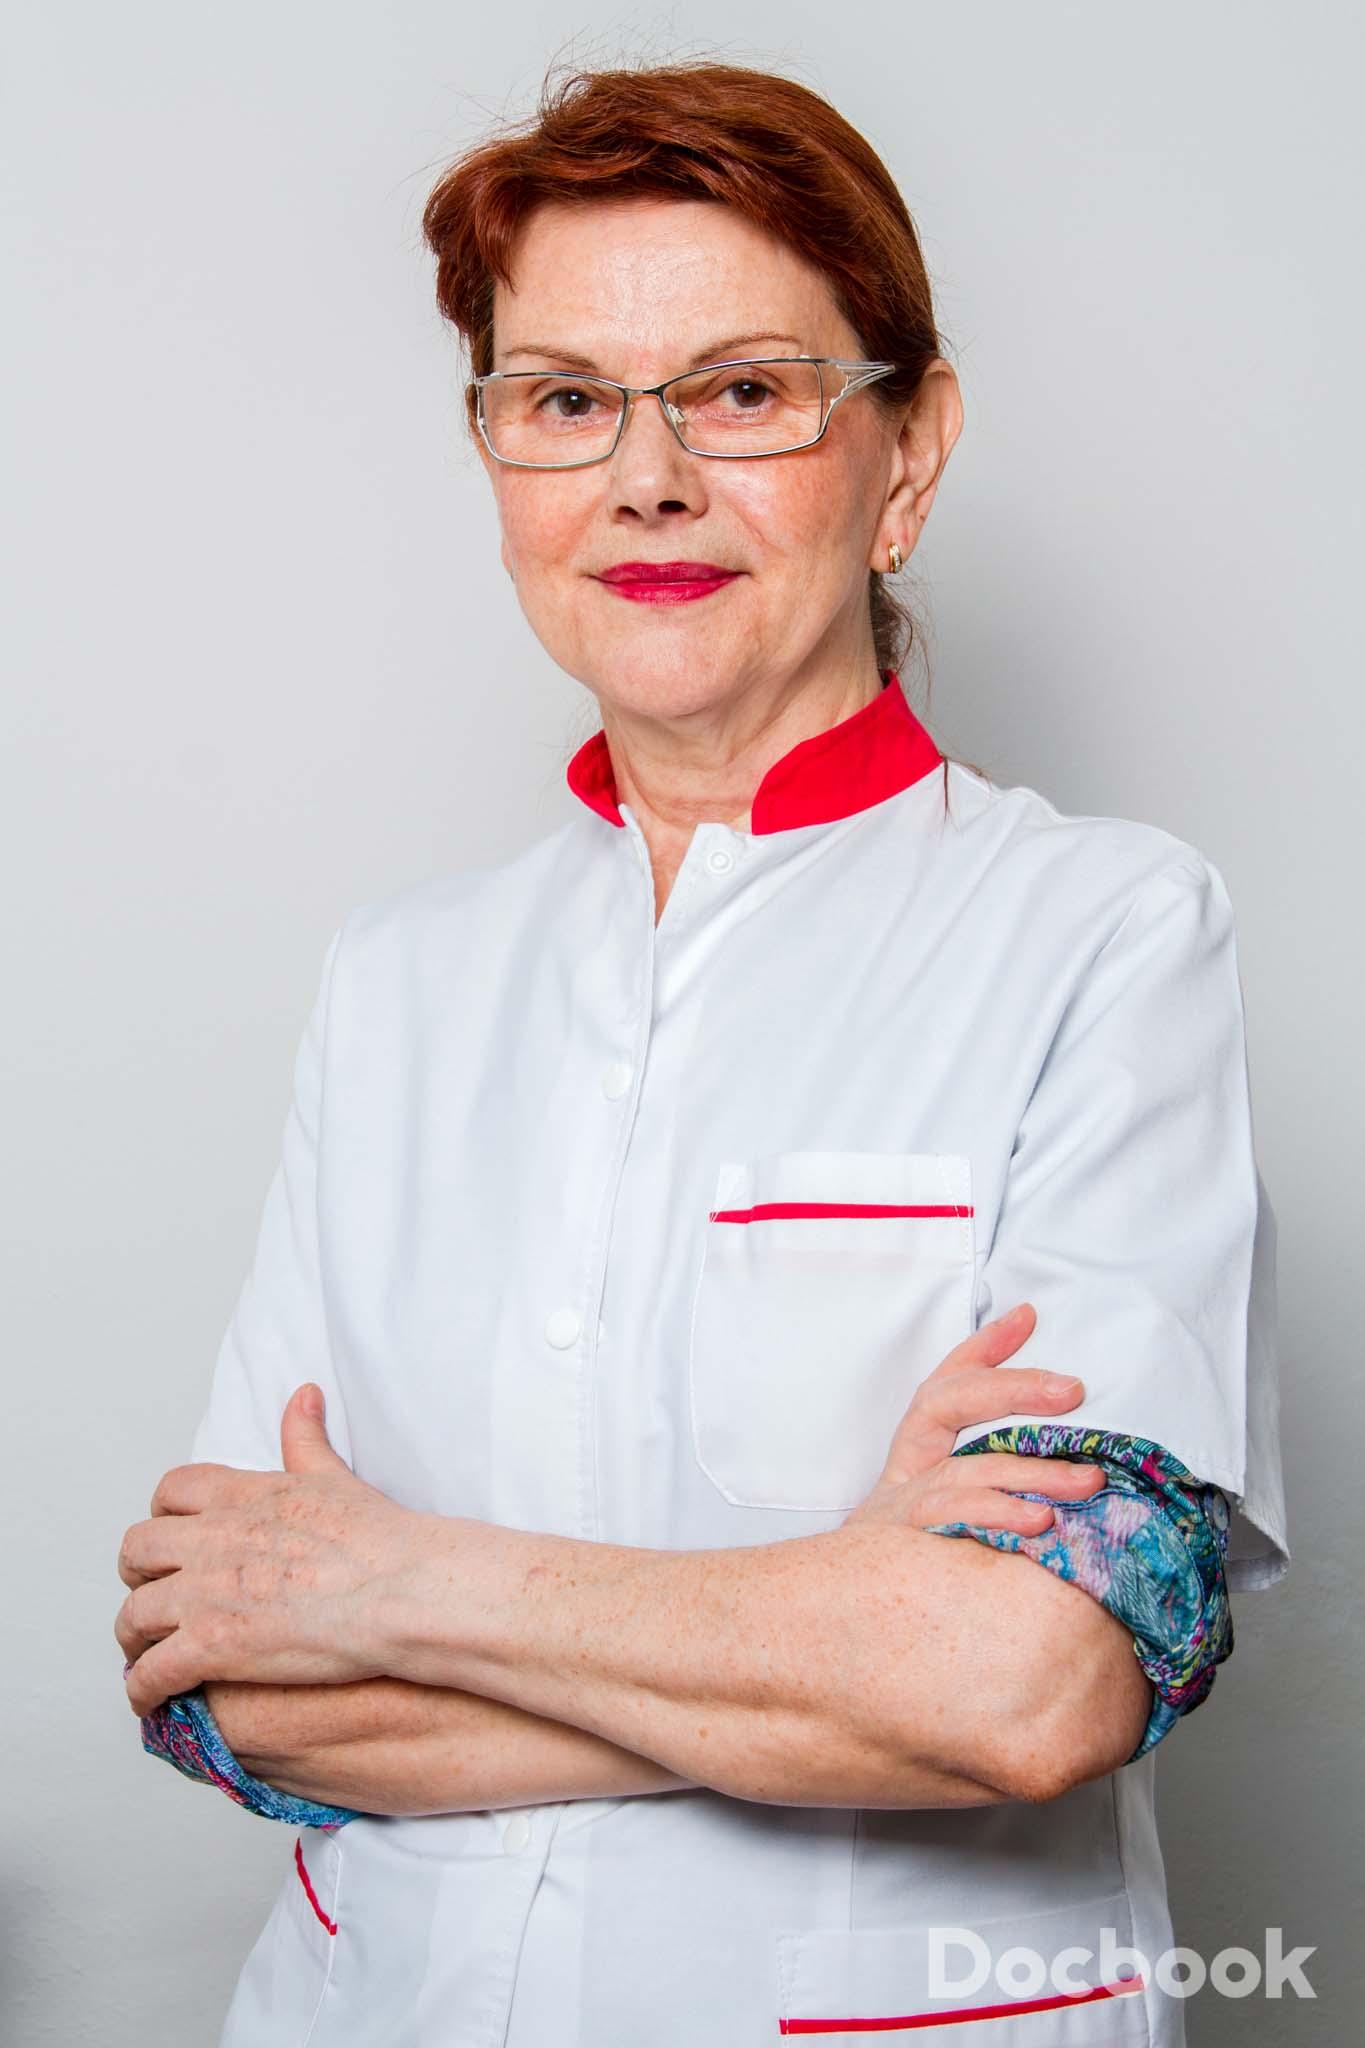 Dr. Maria Dumitrescu